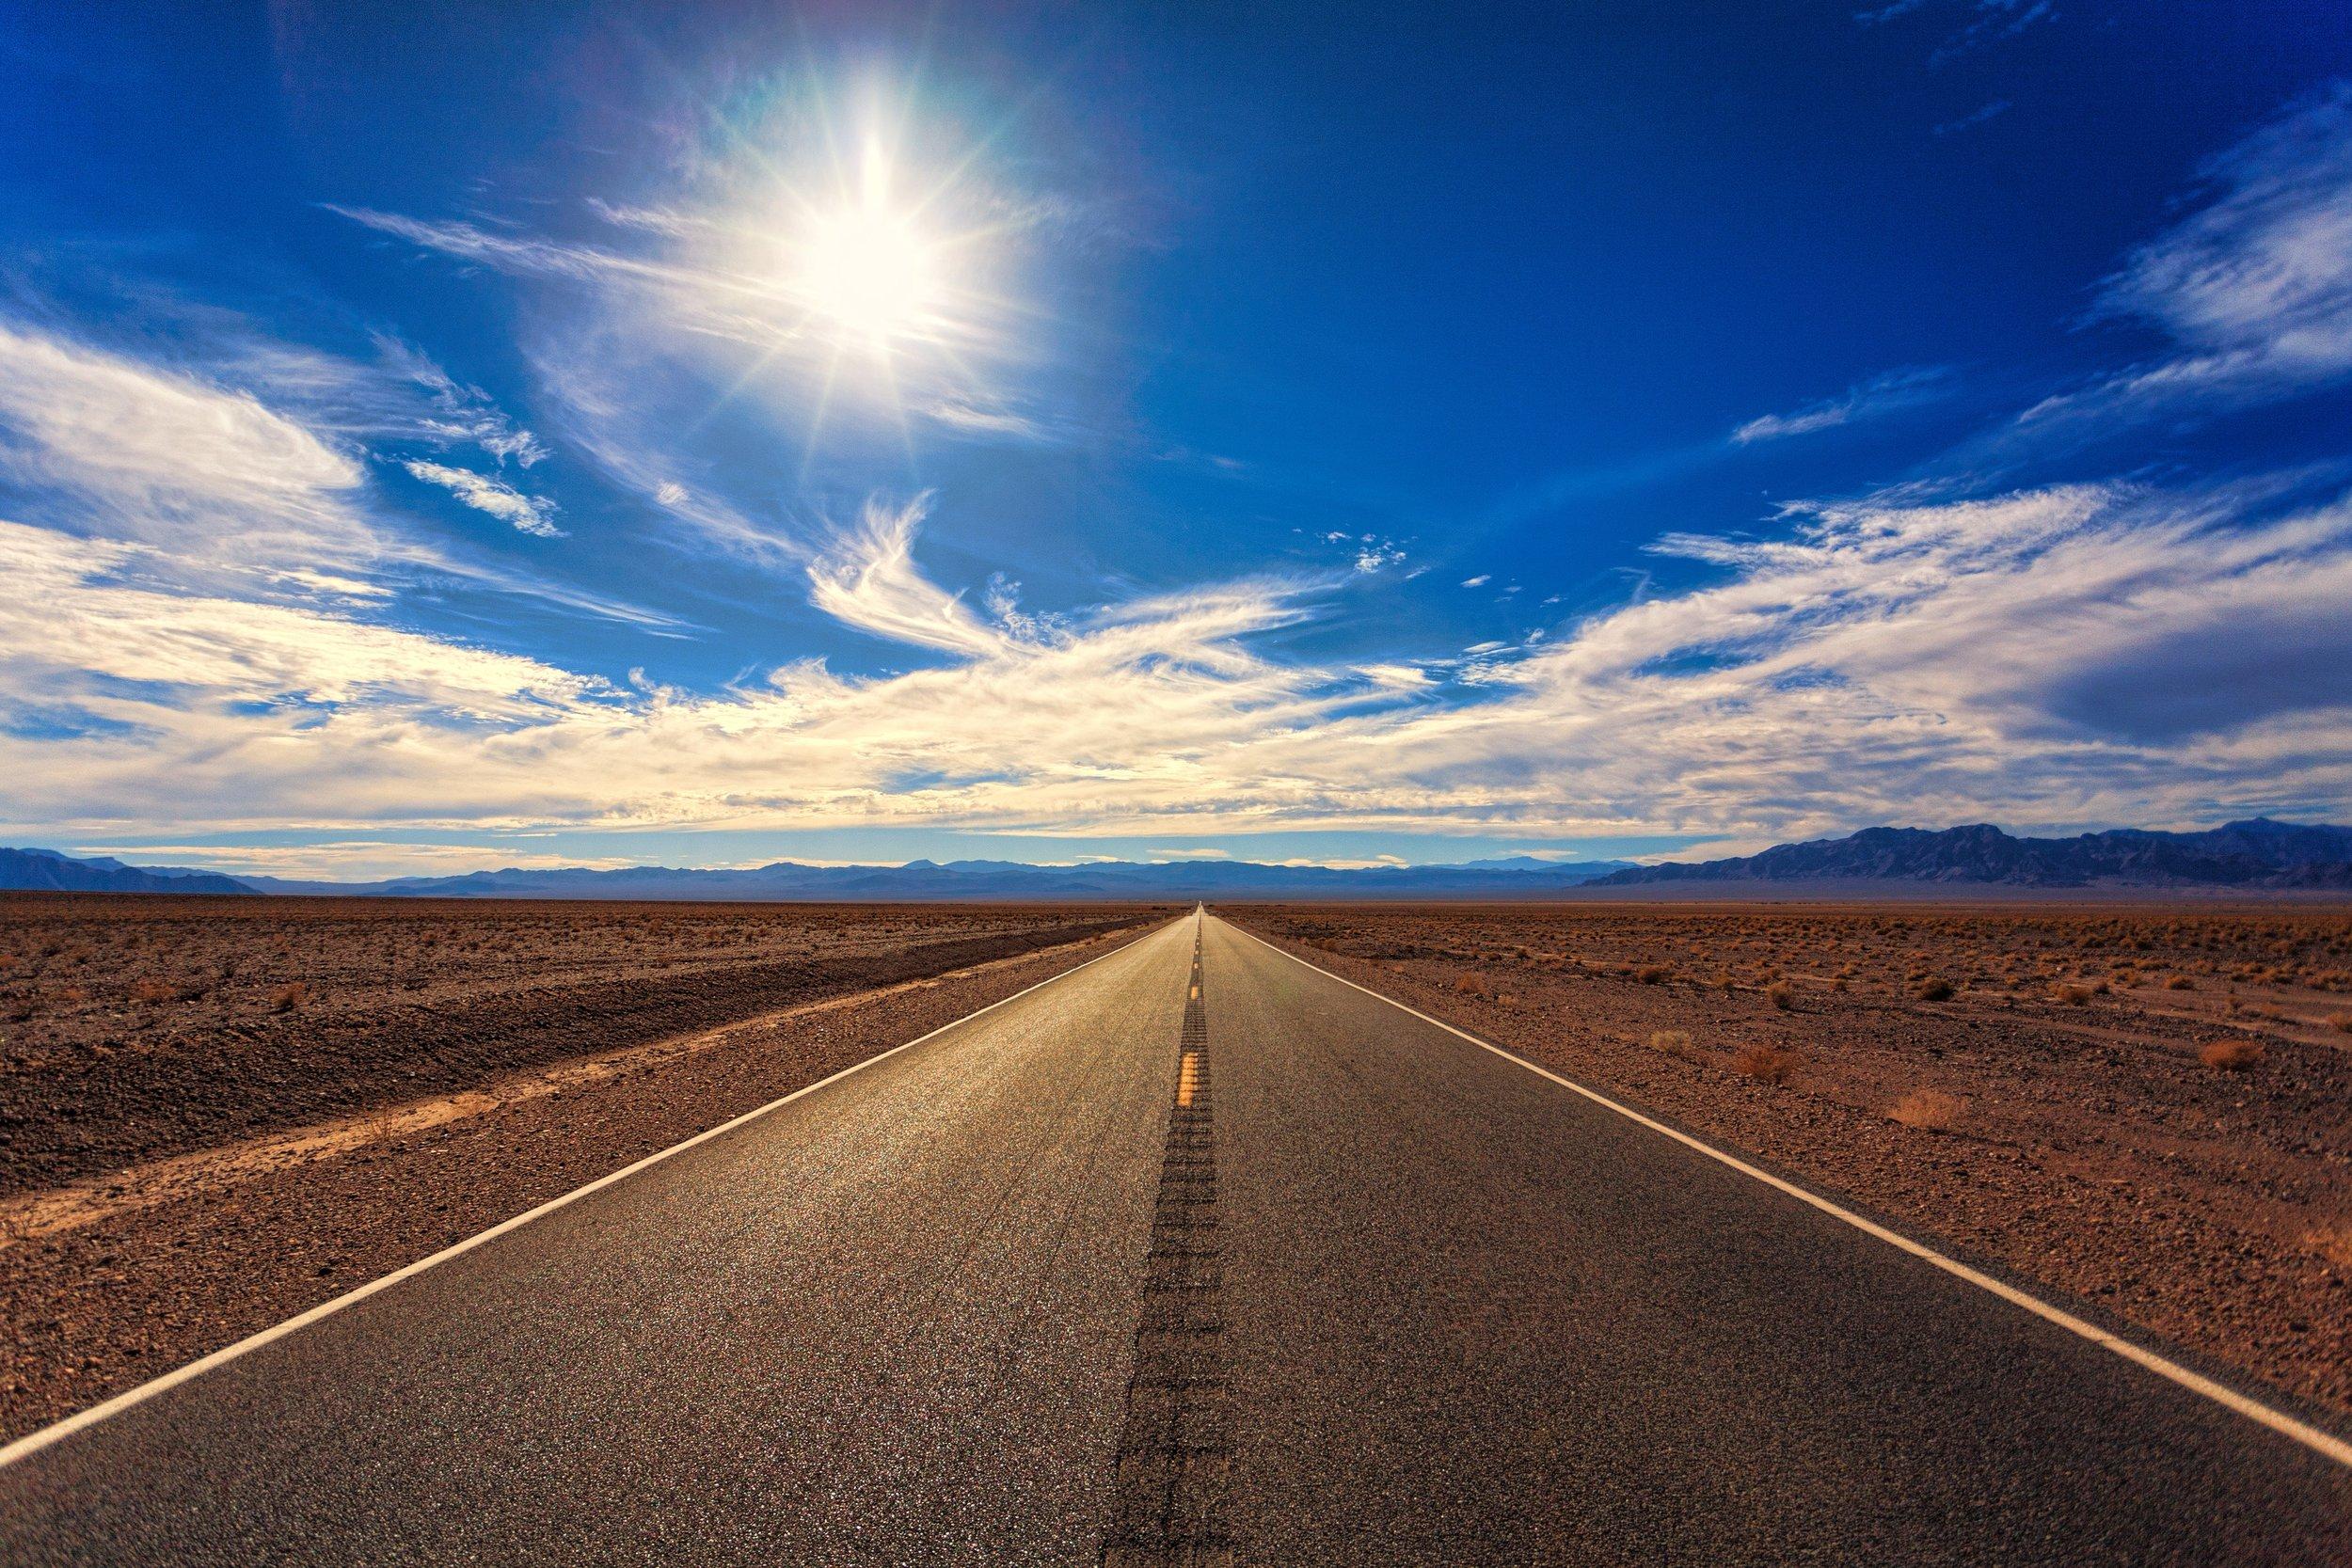 asphalt-blue-clouds-1133505.jpg